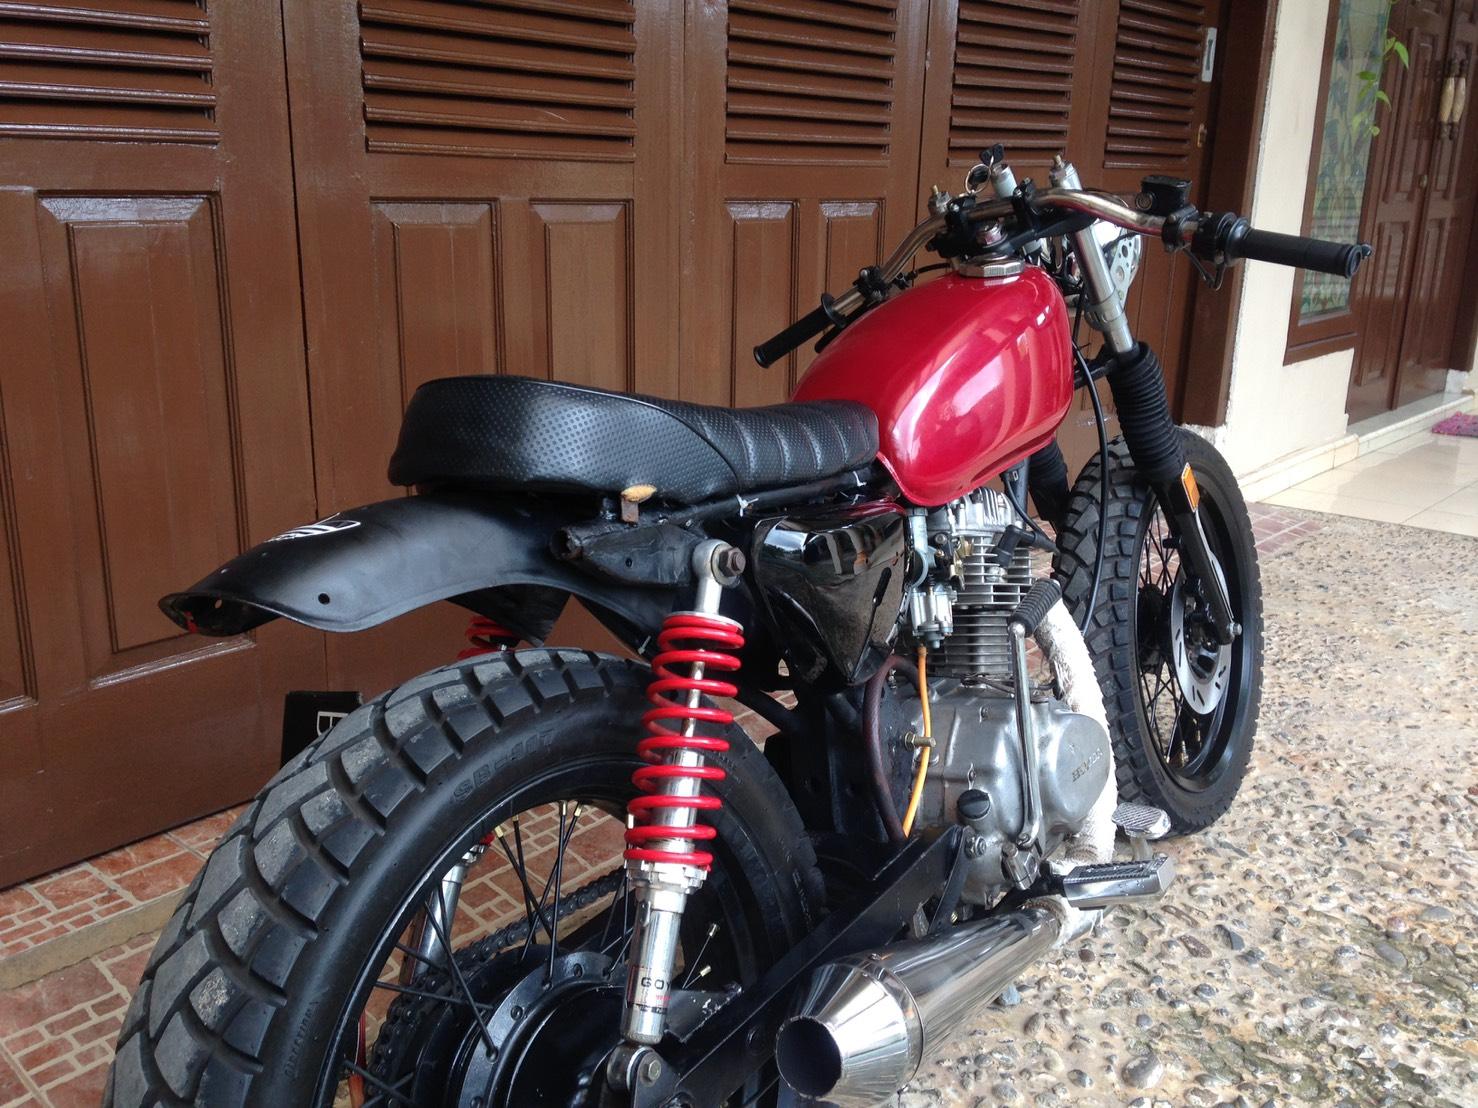 101 Modifikasi Motor Cb 100 Cafe Racer Modifikasi Motor Honda CB